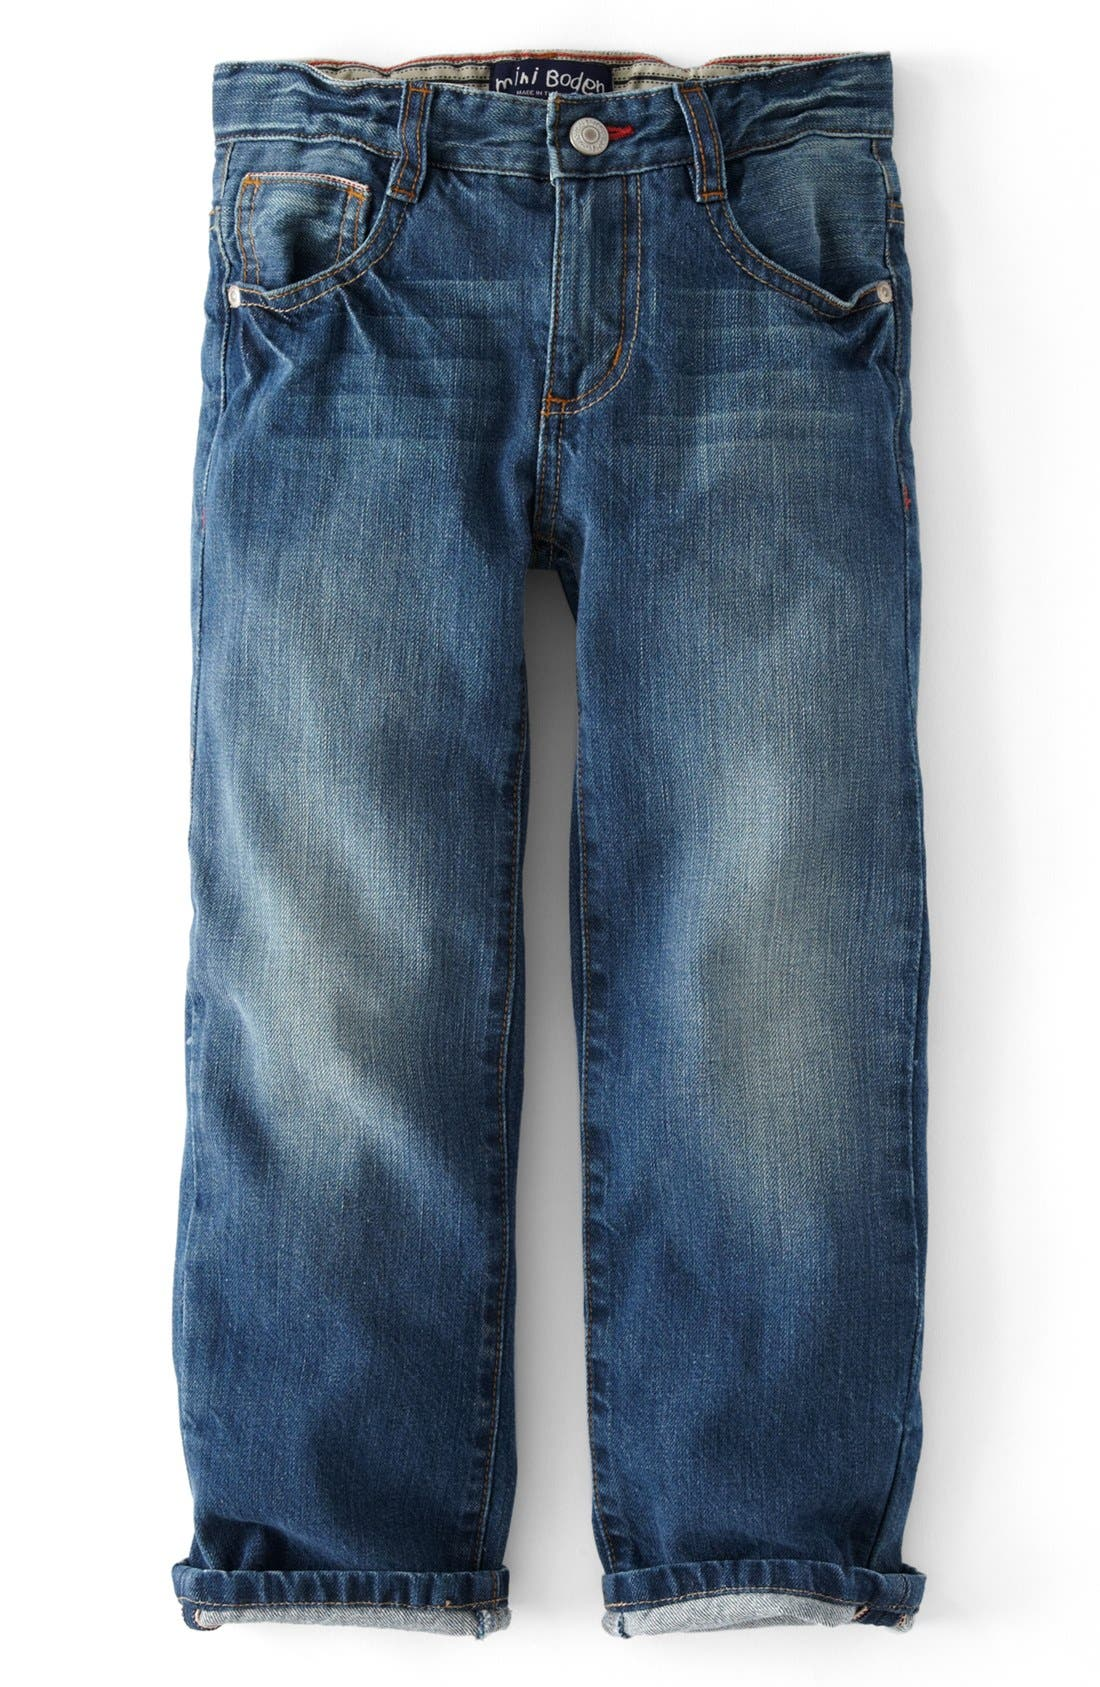 Main Image - Mini Boden Vintage Jeans (Toddler Boys, Little Boys & Big Boy)